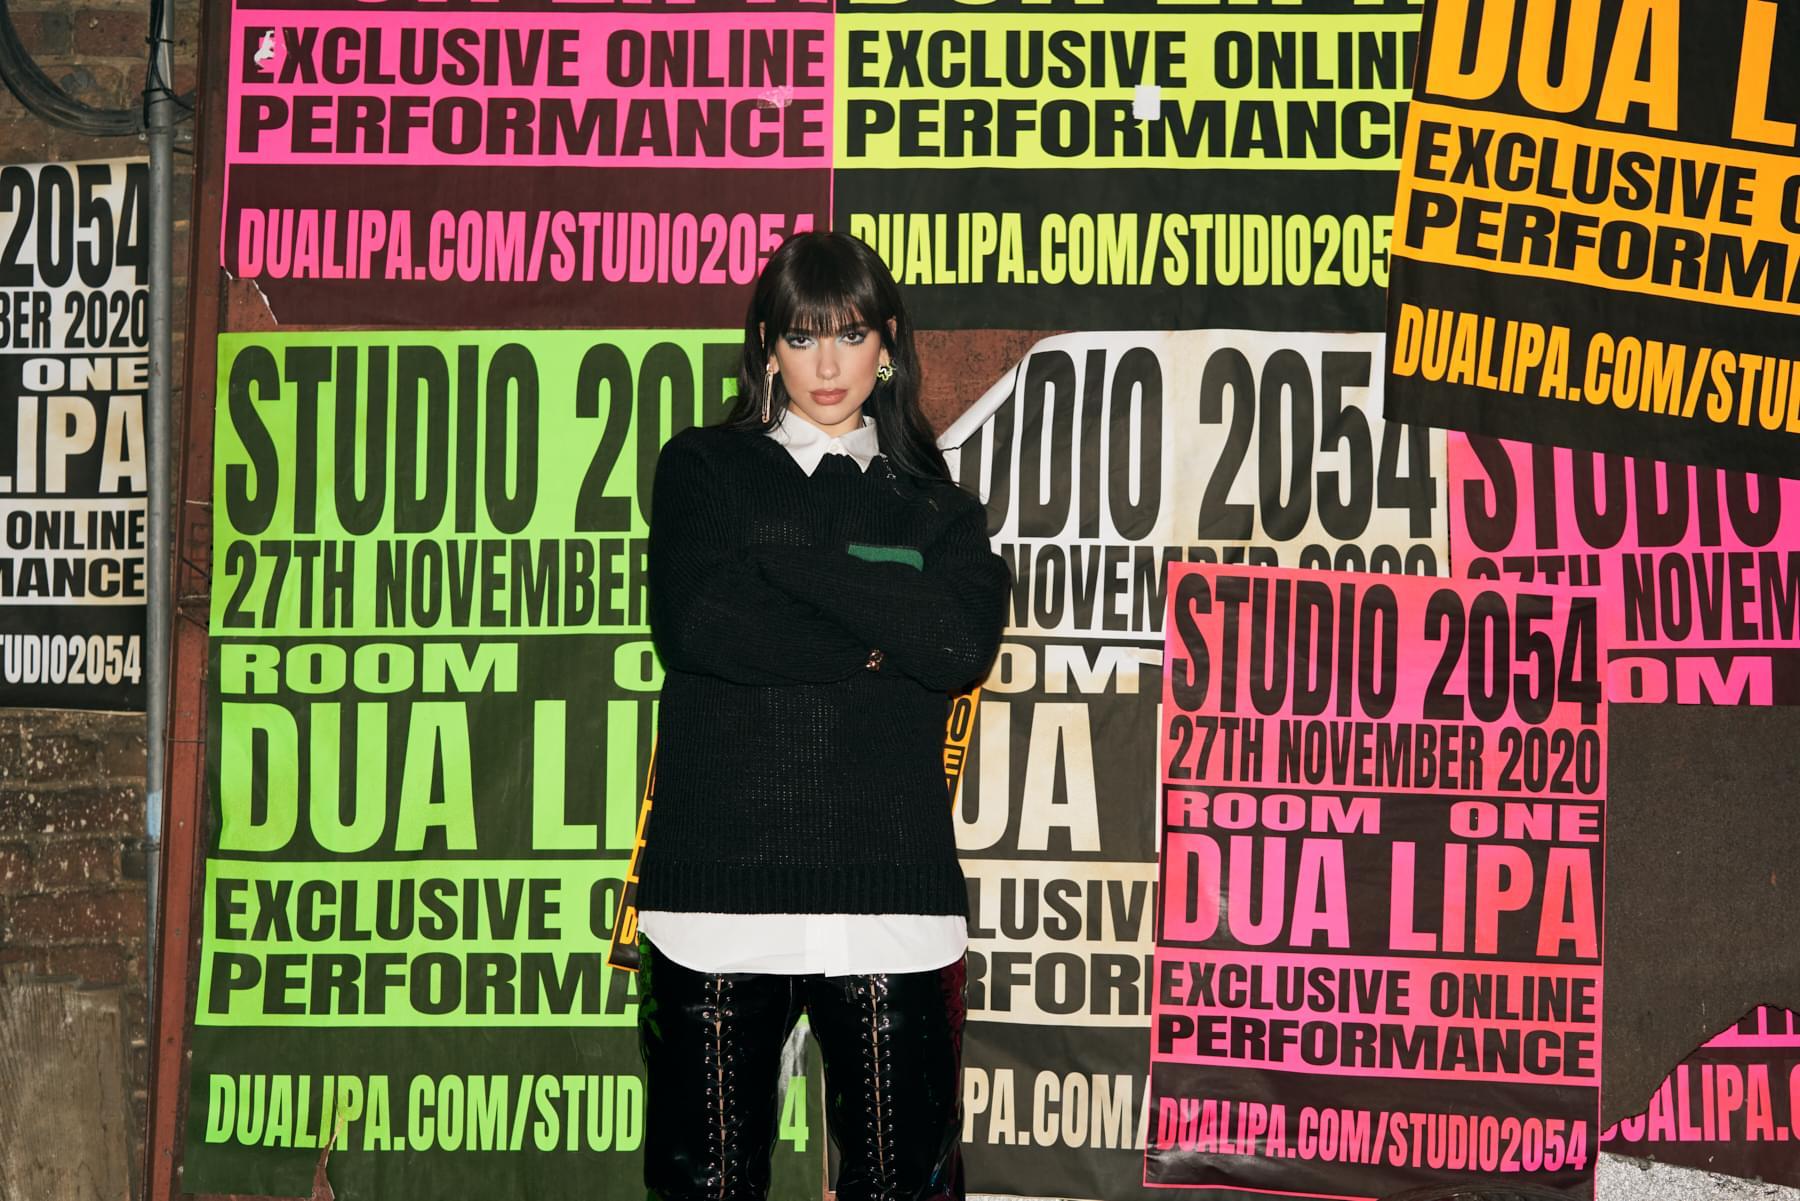 Win tickets to Dua Lipa'sSTUDIO 2054 Livestream